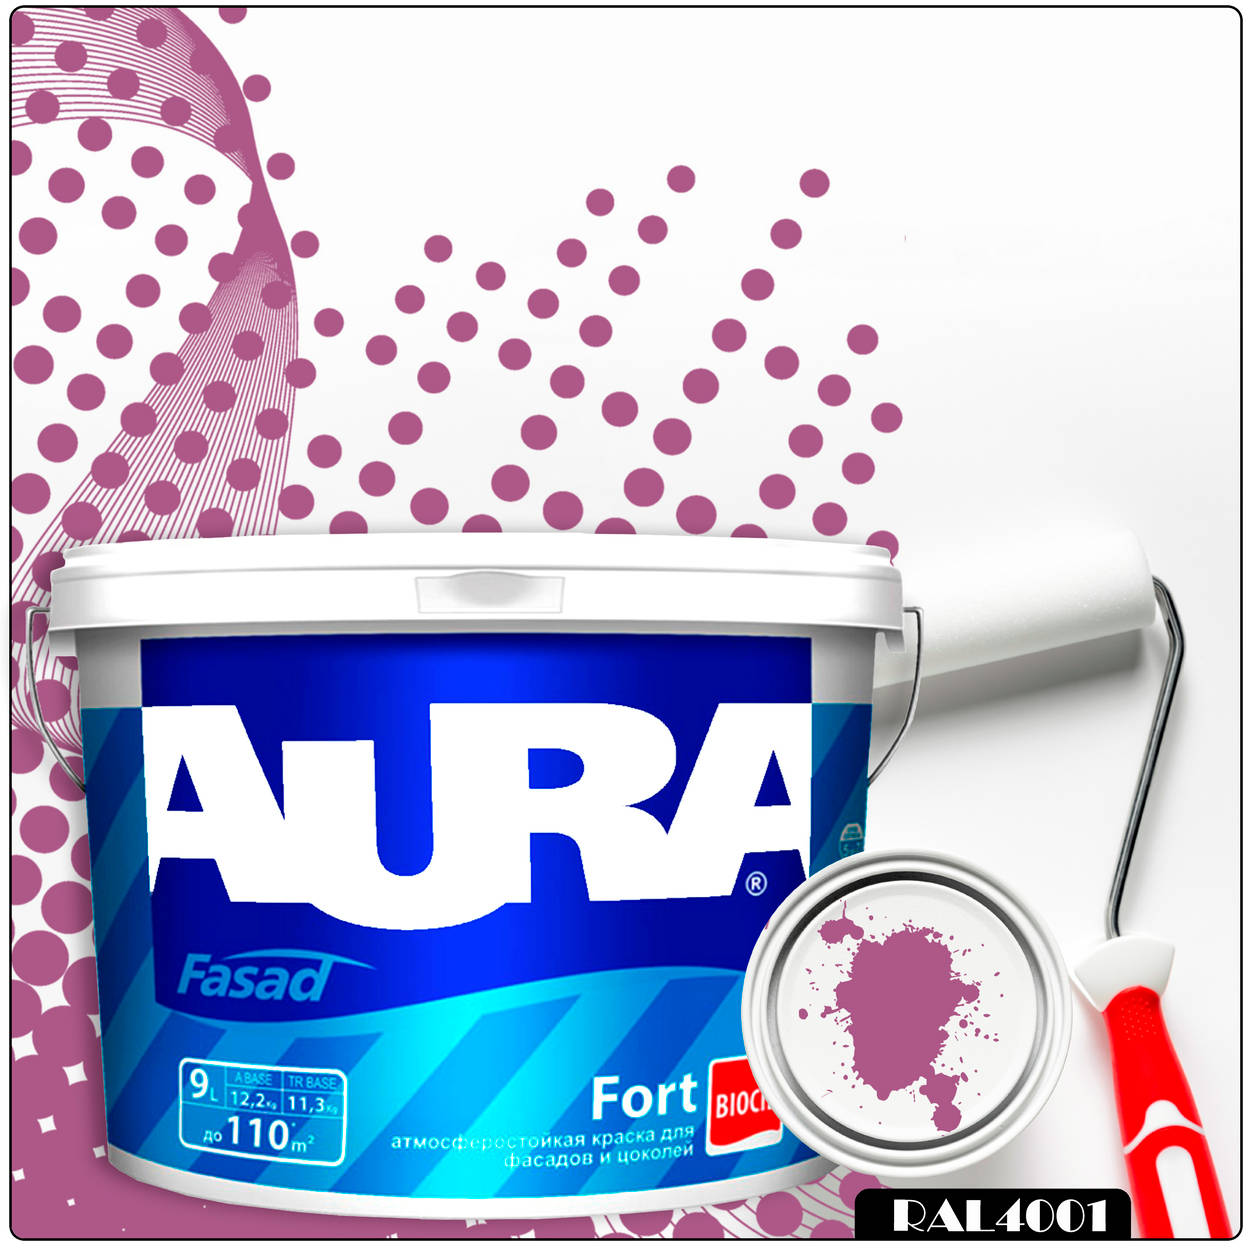 Фото 1 - Краска Aura Fasad Fort, RAL 4001 Красно-сиреневый, латексная, матовая, для фасада и цоколей, 9л, Аура.